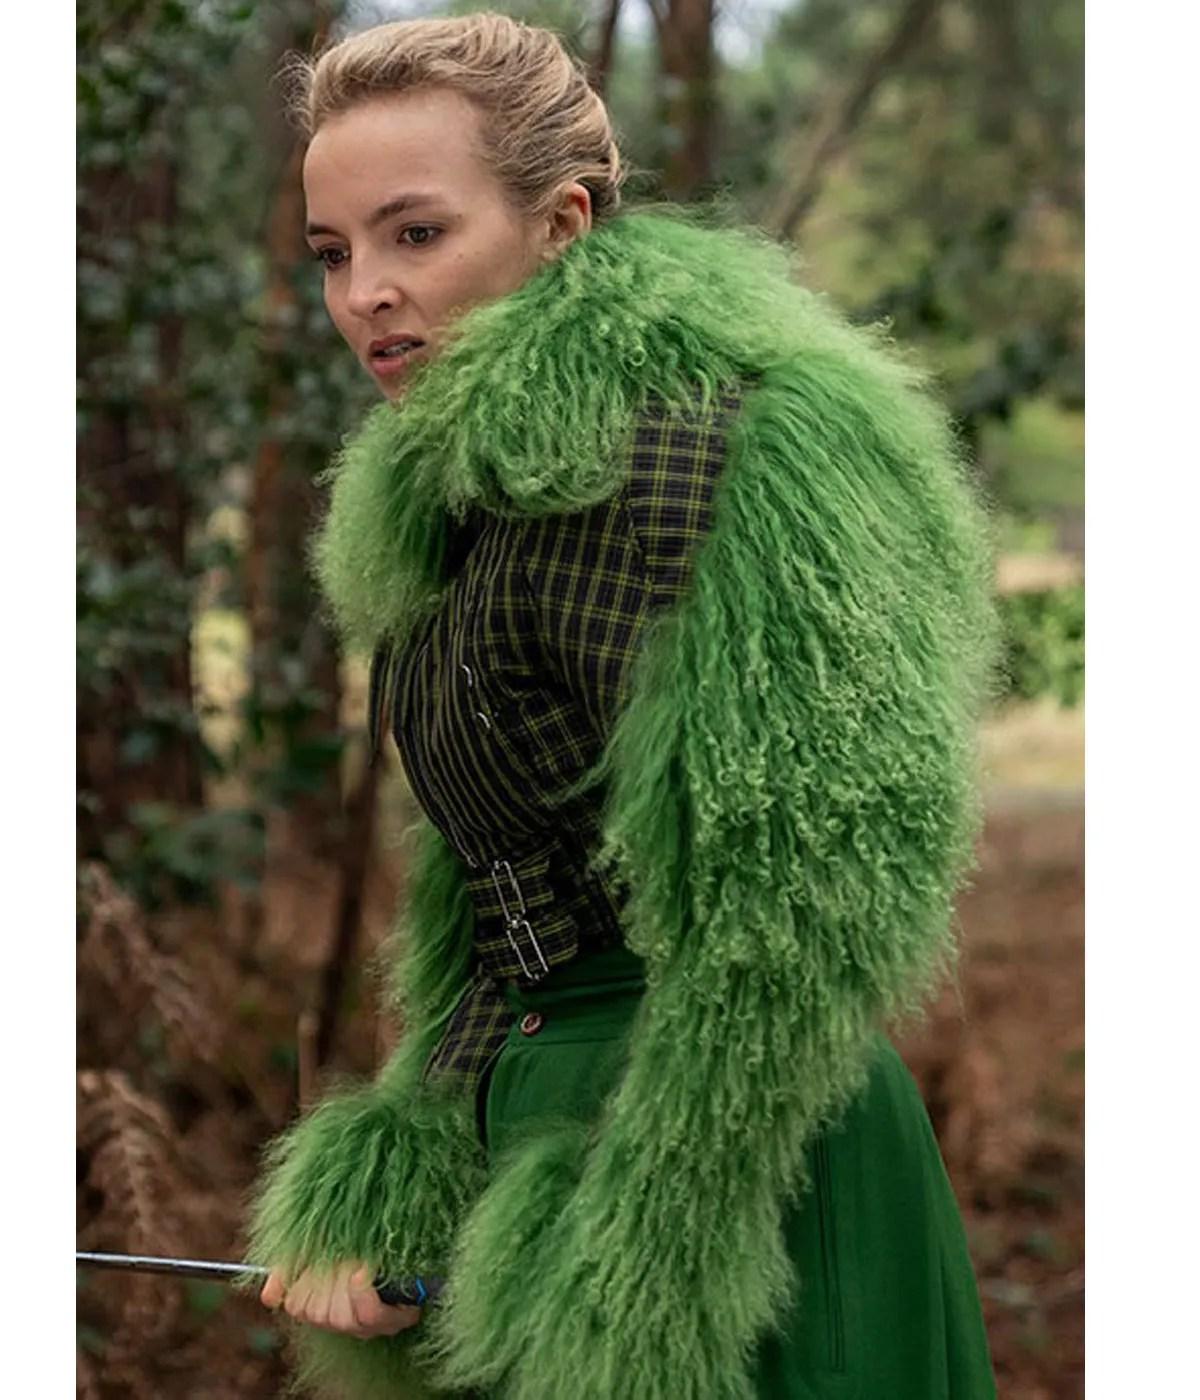 jodie-comer-killing-eve-season-03-villanelle-jacket